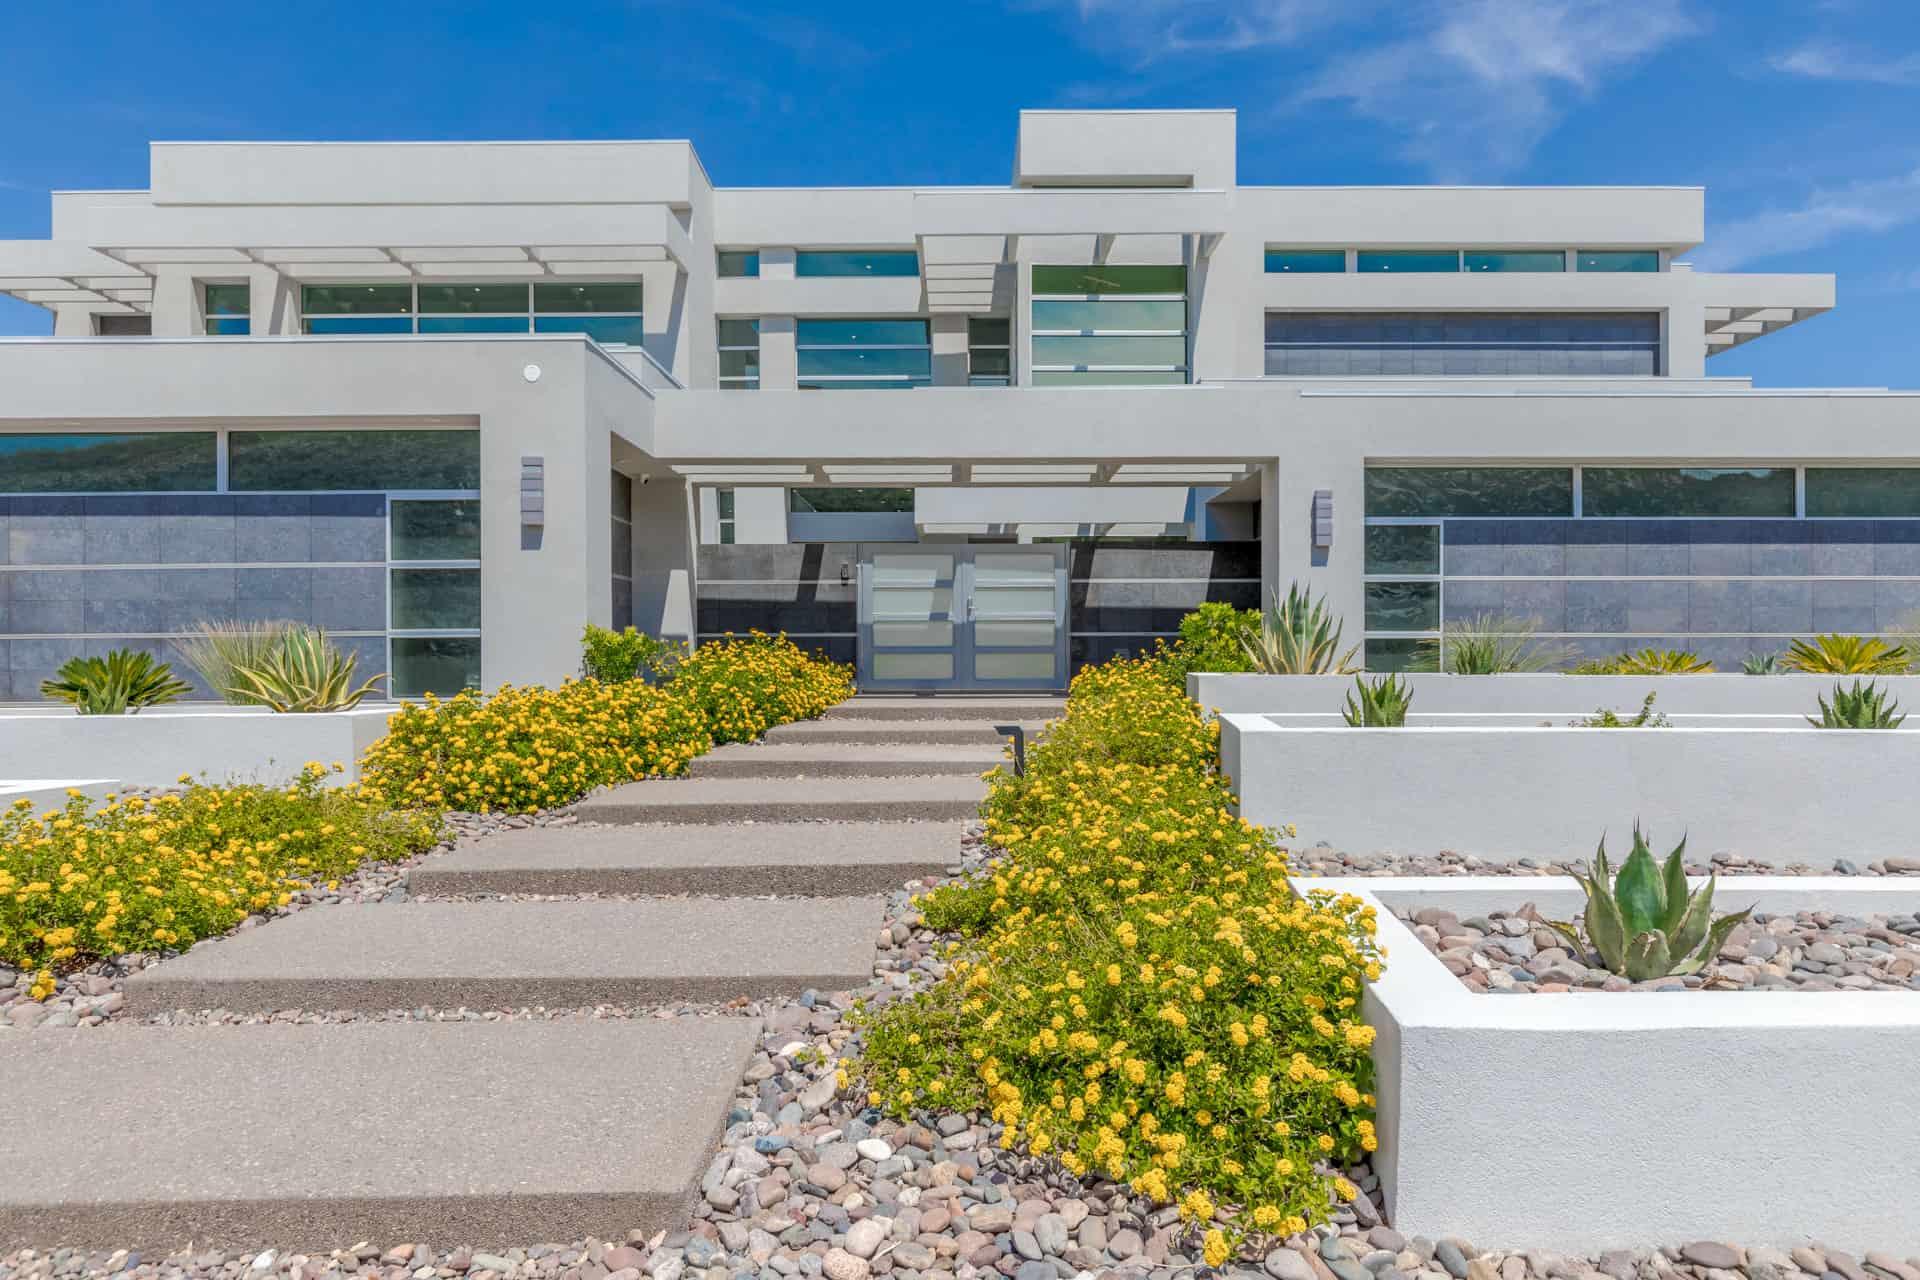 las-vegas-luxry-real-estate-realtor-rob-jensen-company-5-rockstream-drive-ascaya014